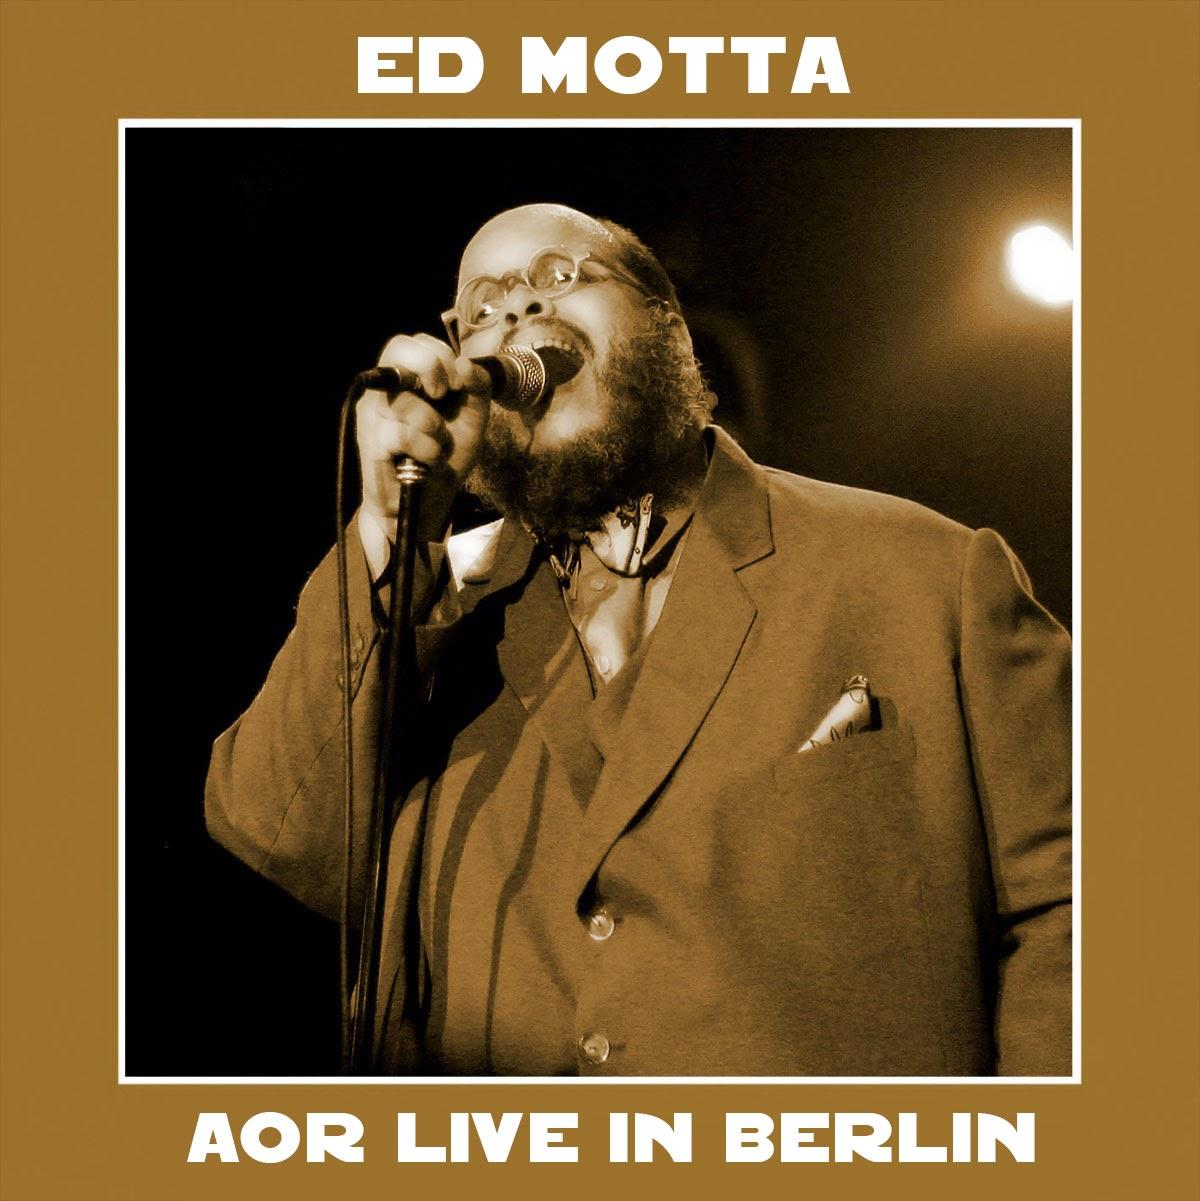 ED VIVO BAIXAR AO DVD CD MOTTA POPTICAL